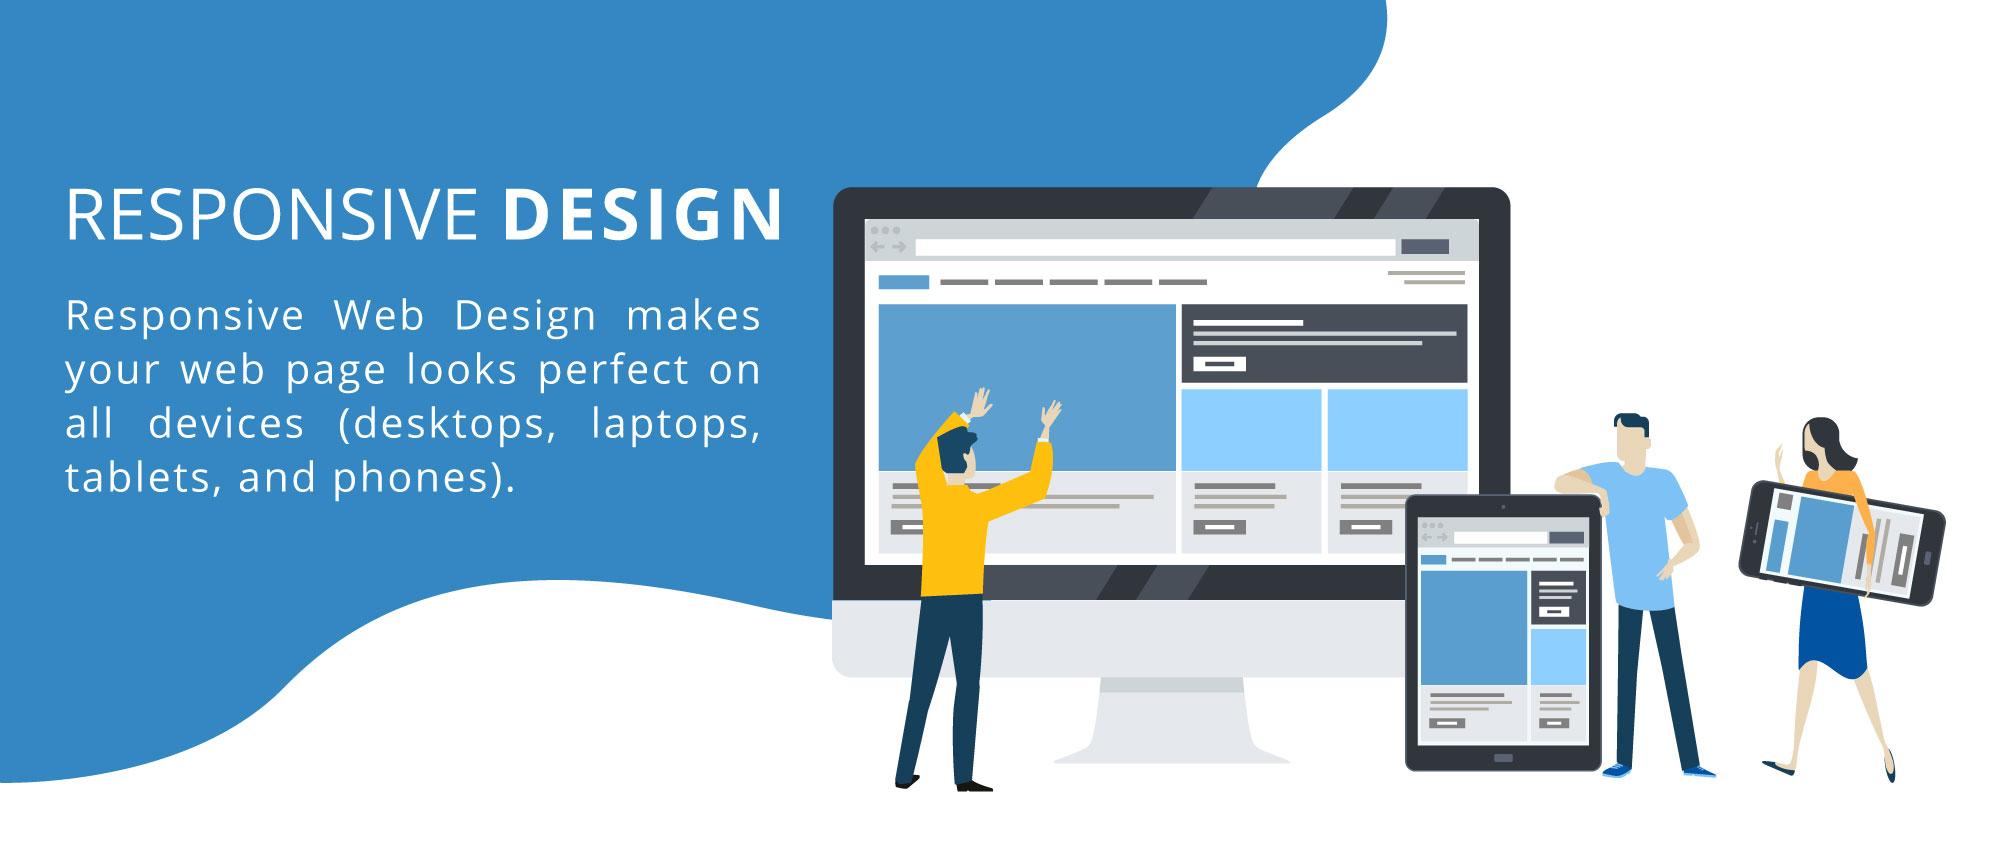 Responsive Design, Web Design & Web Development, Responsive Design, Web Design & Web Development Lebanon Beirut, Responsive Design, Web Design & Web Development In Lebanon Beirut